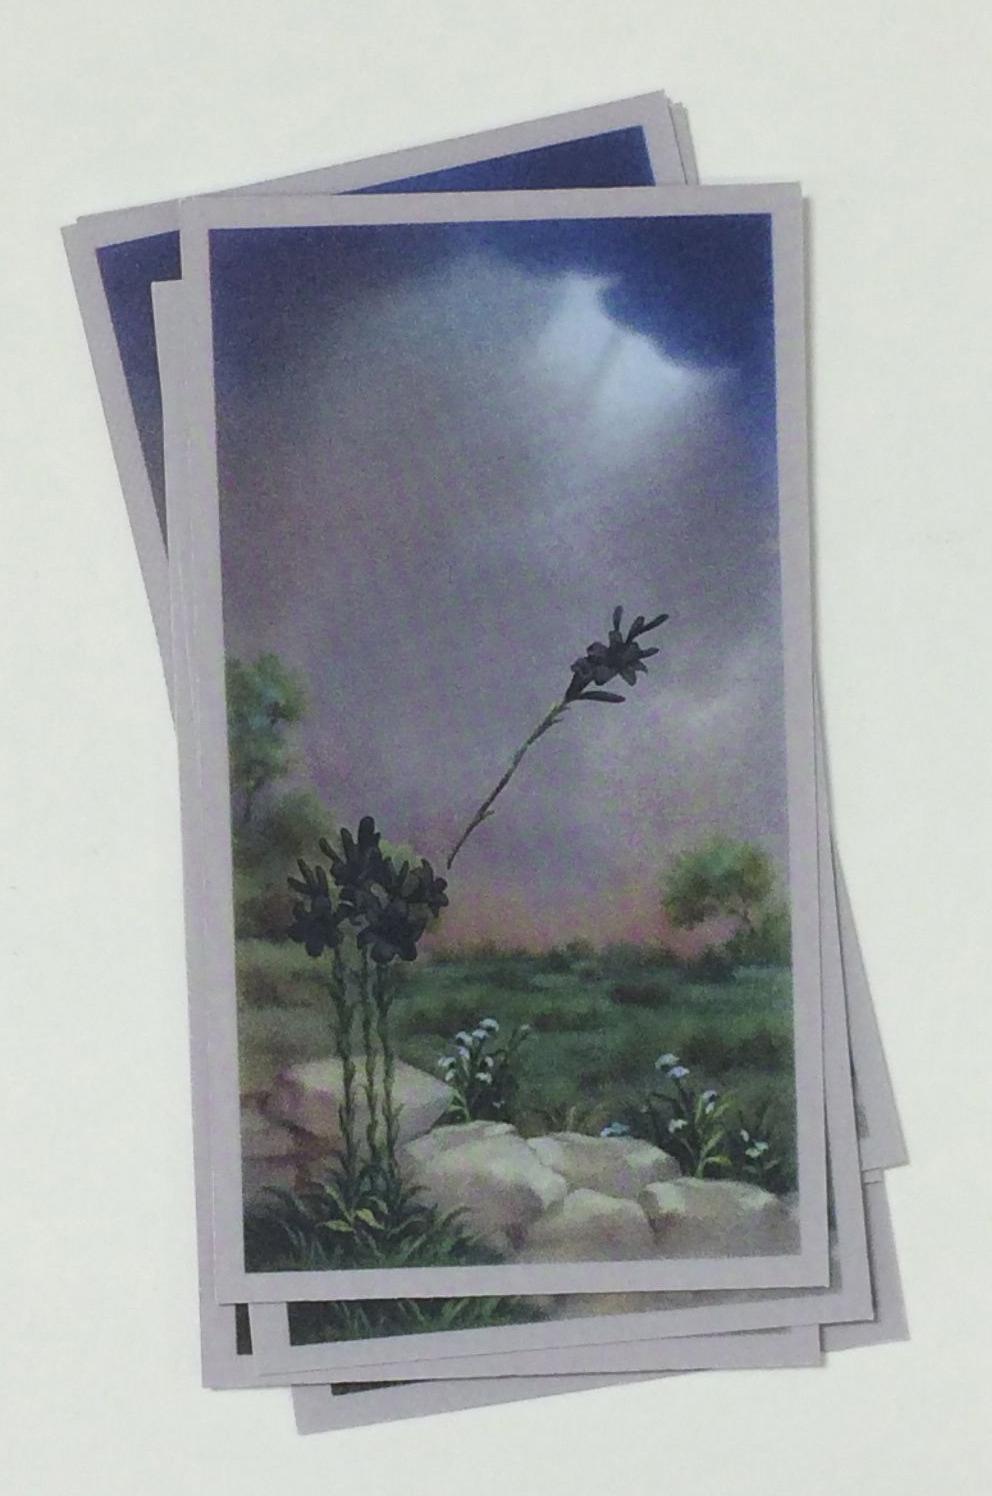 Untitled (prayer card)